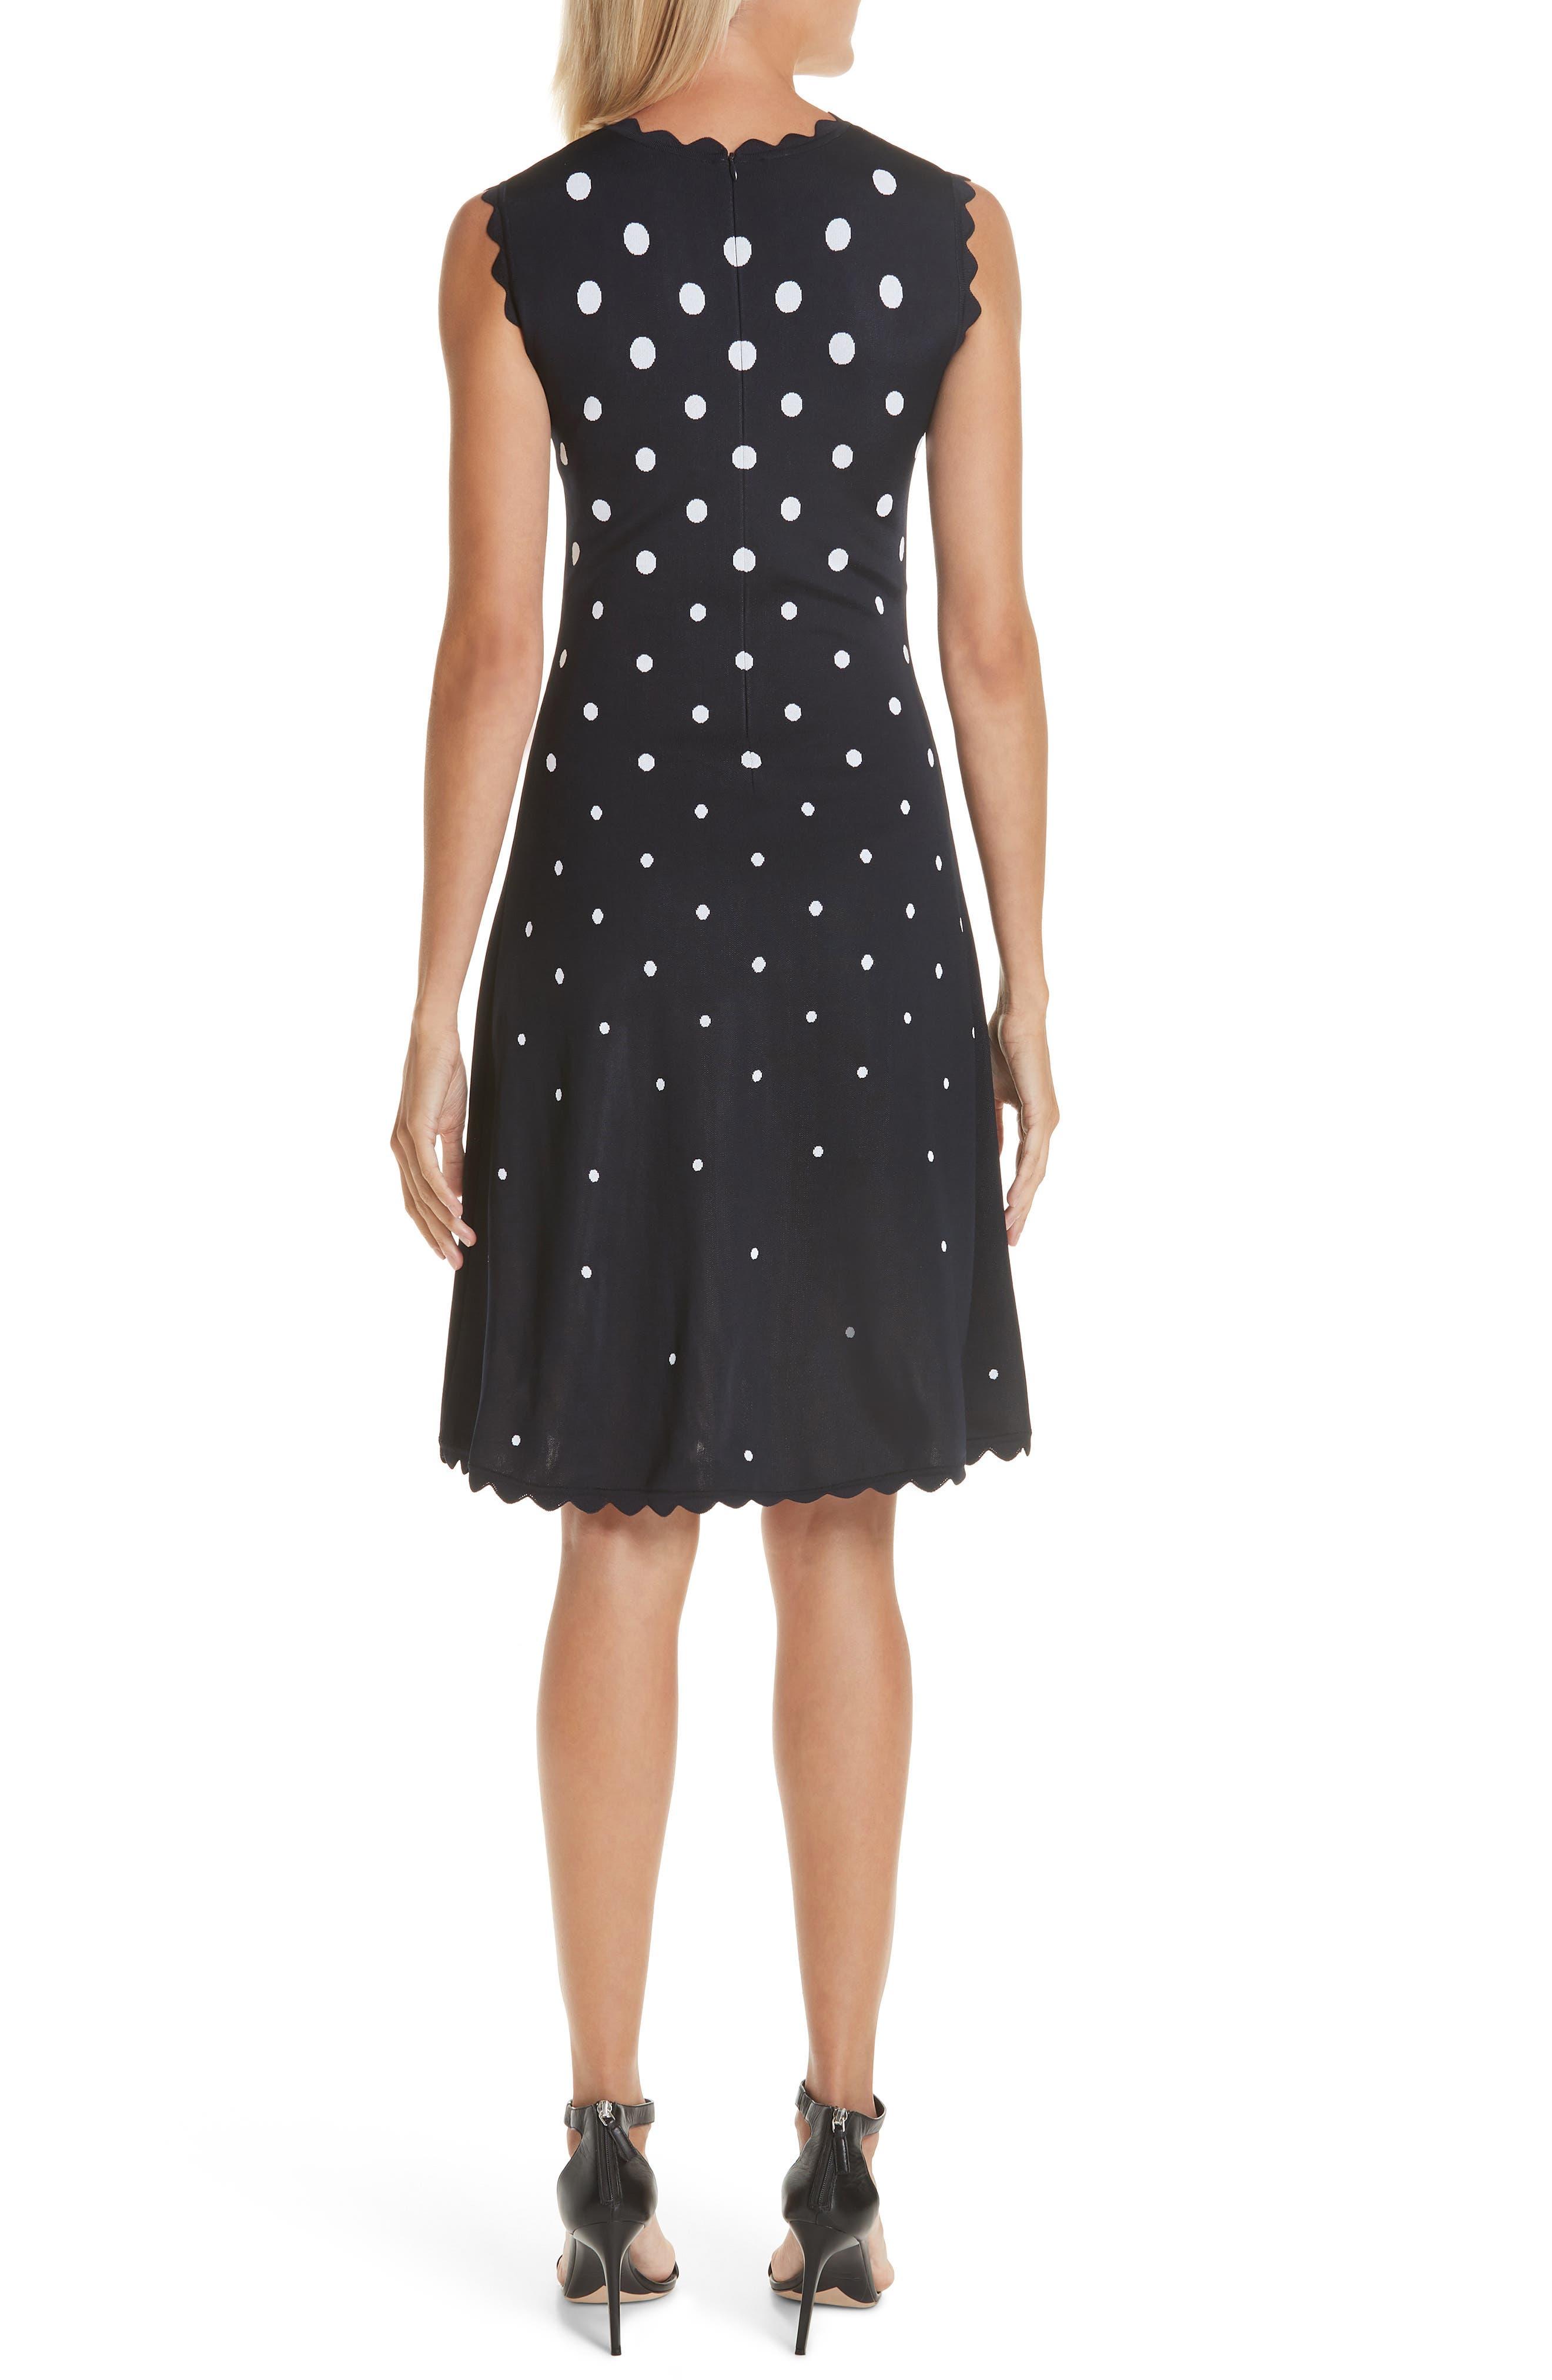 Scallop Edge Polka Dot A-Line Dress,                             Alternate thumbnail 2, color,                             NVW-NAVY/ WHITE